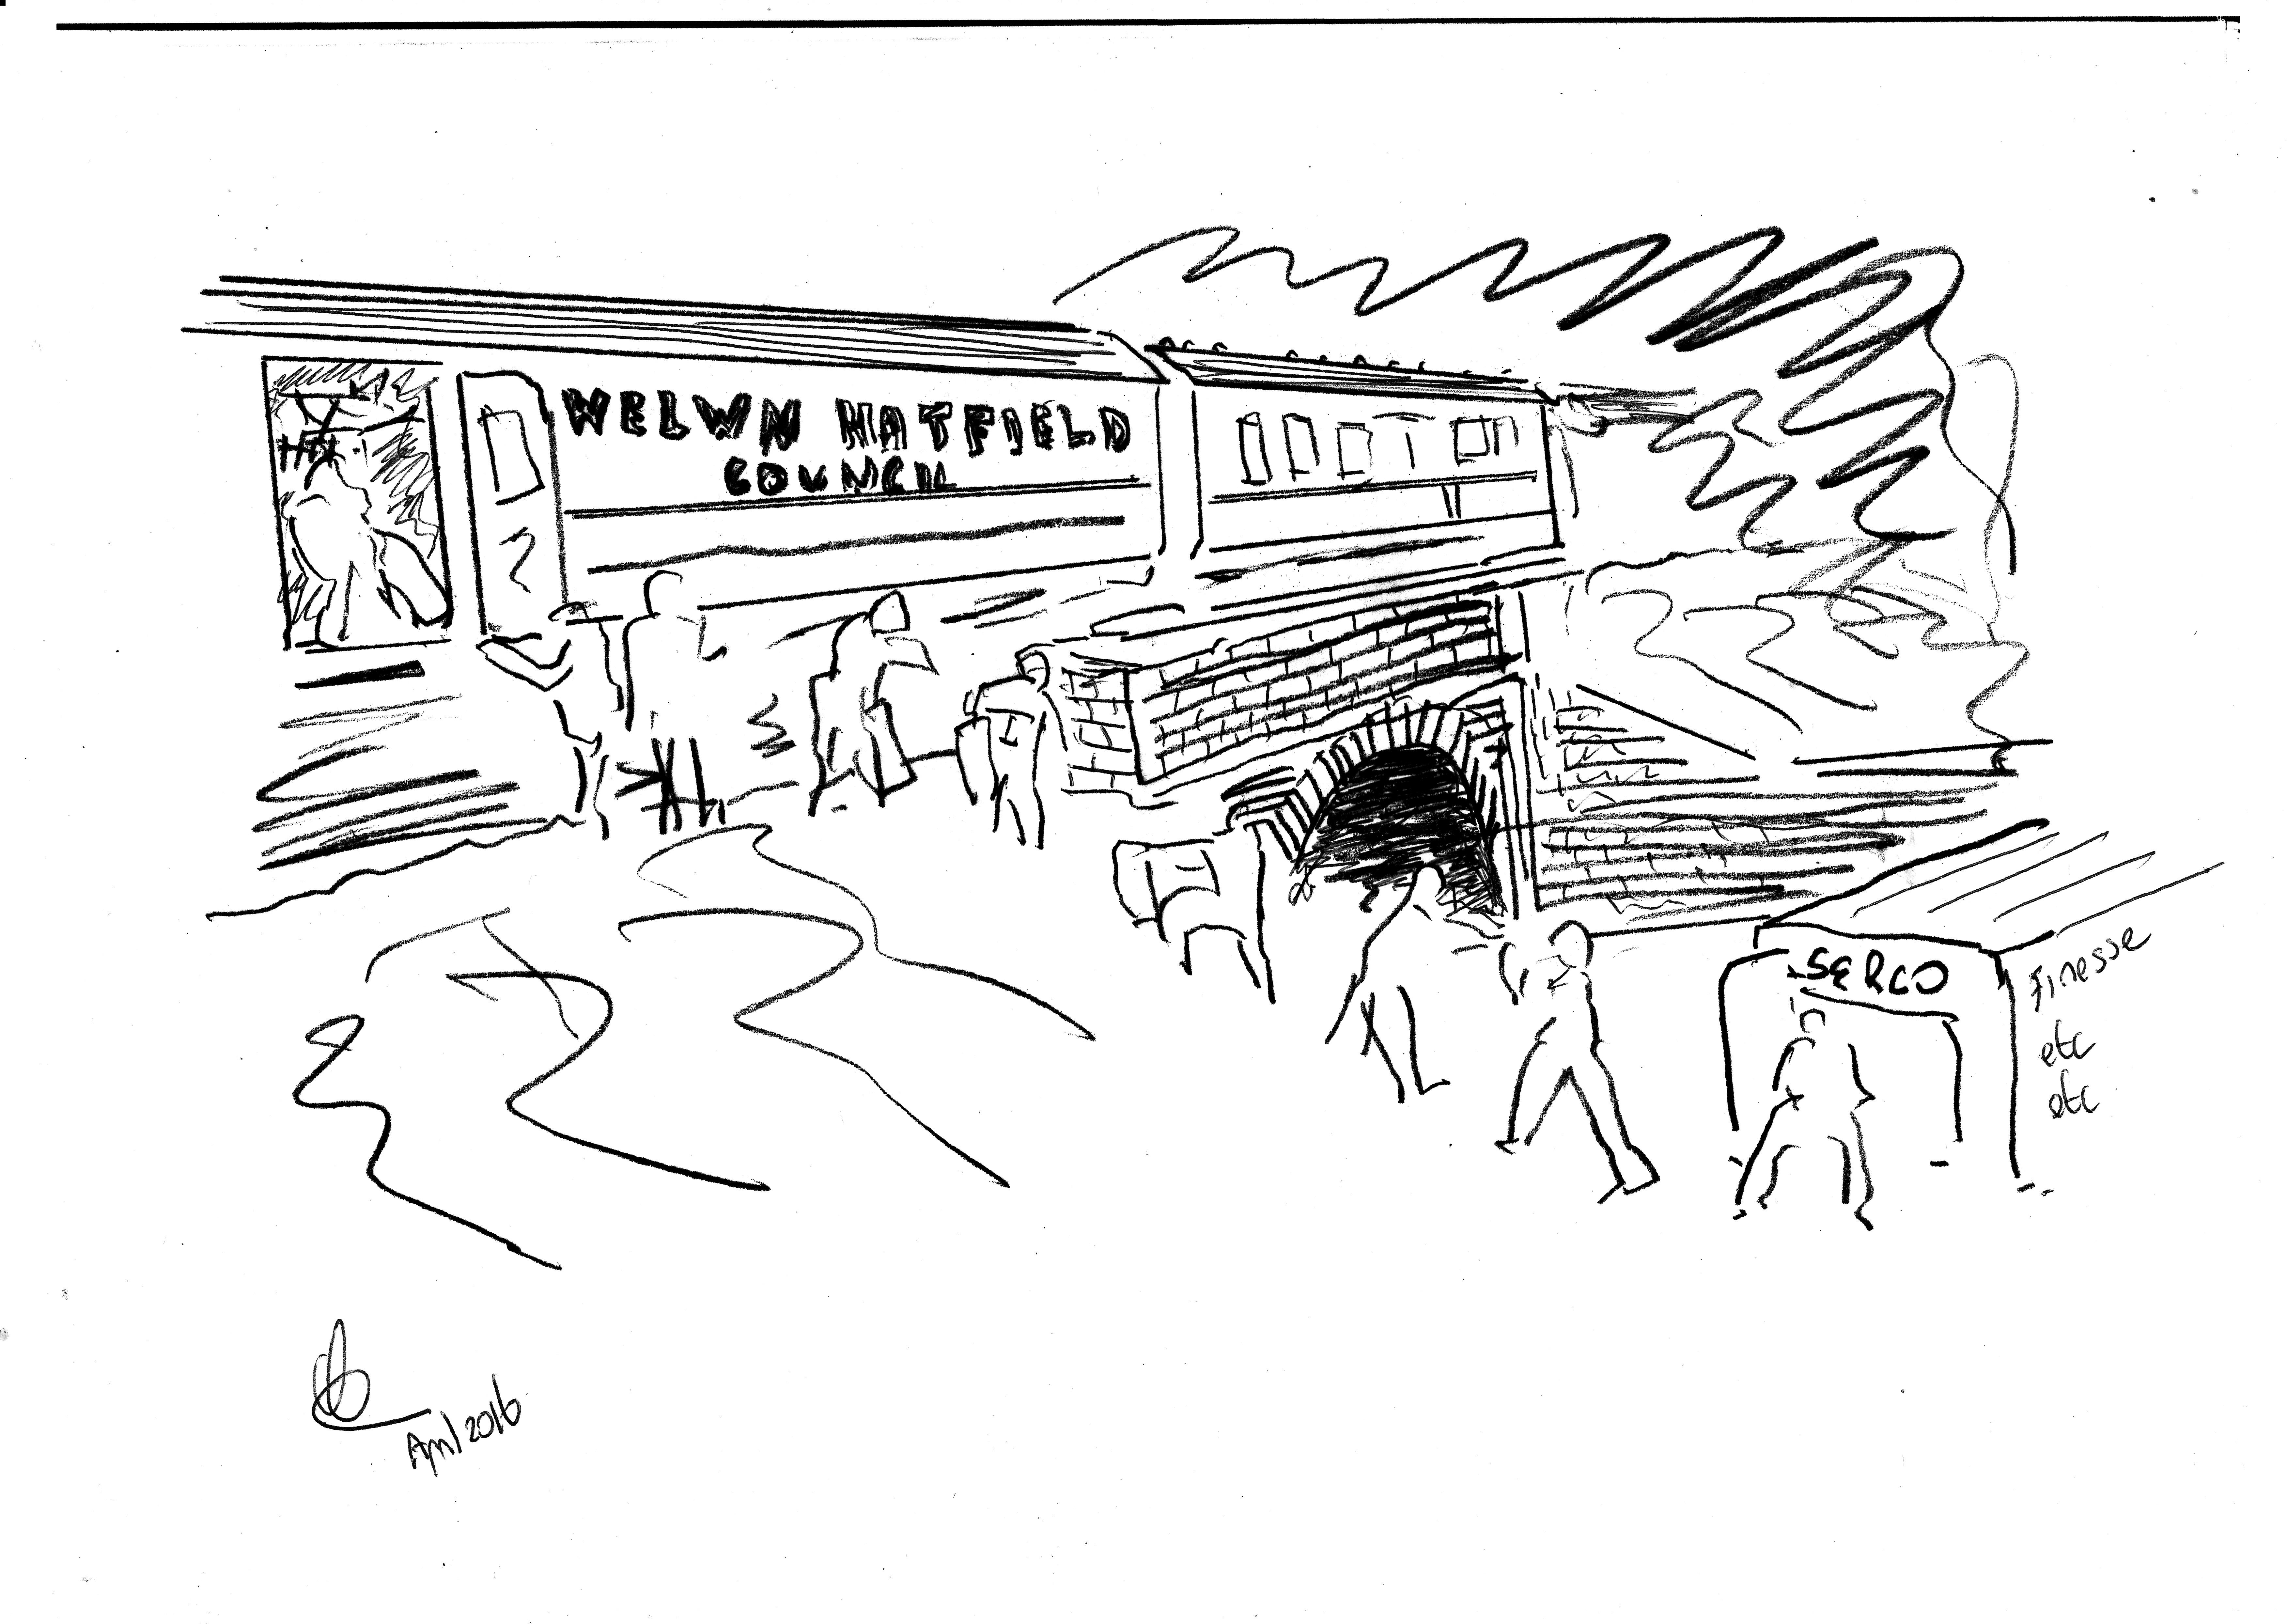 TrainRobberyCartoon_V9_160415.jpg